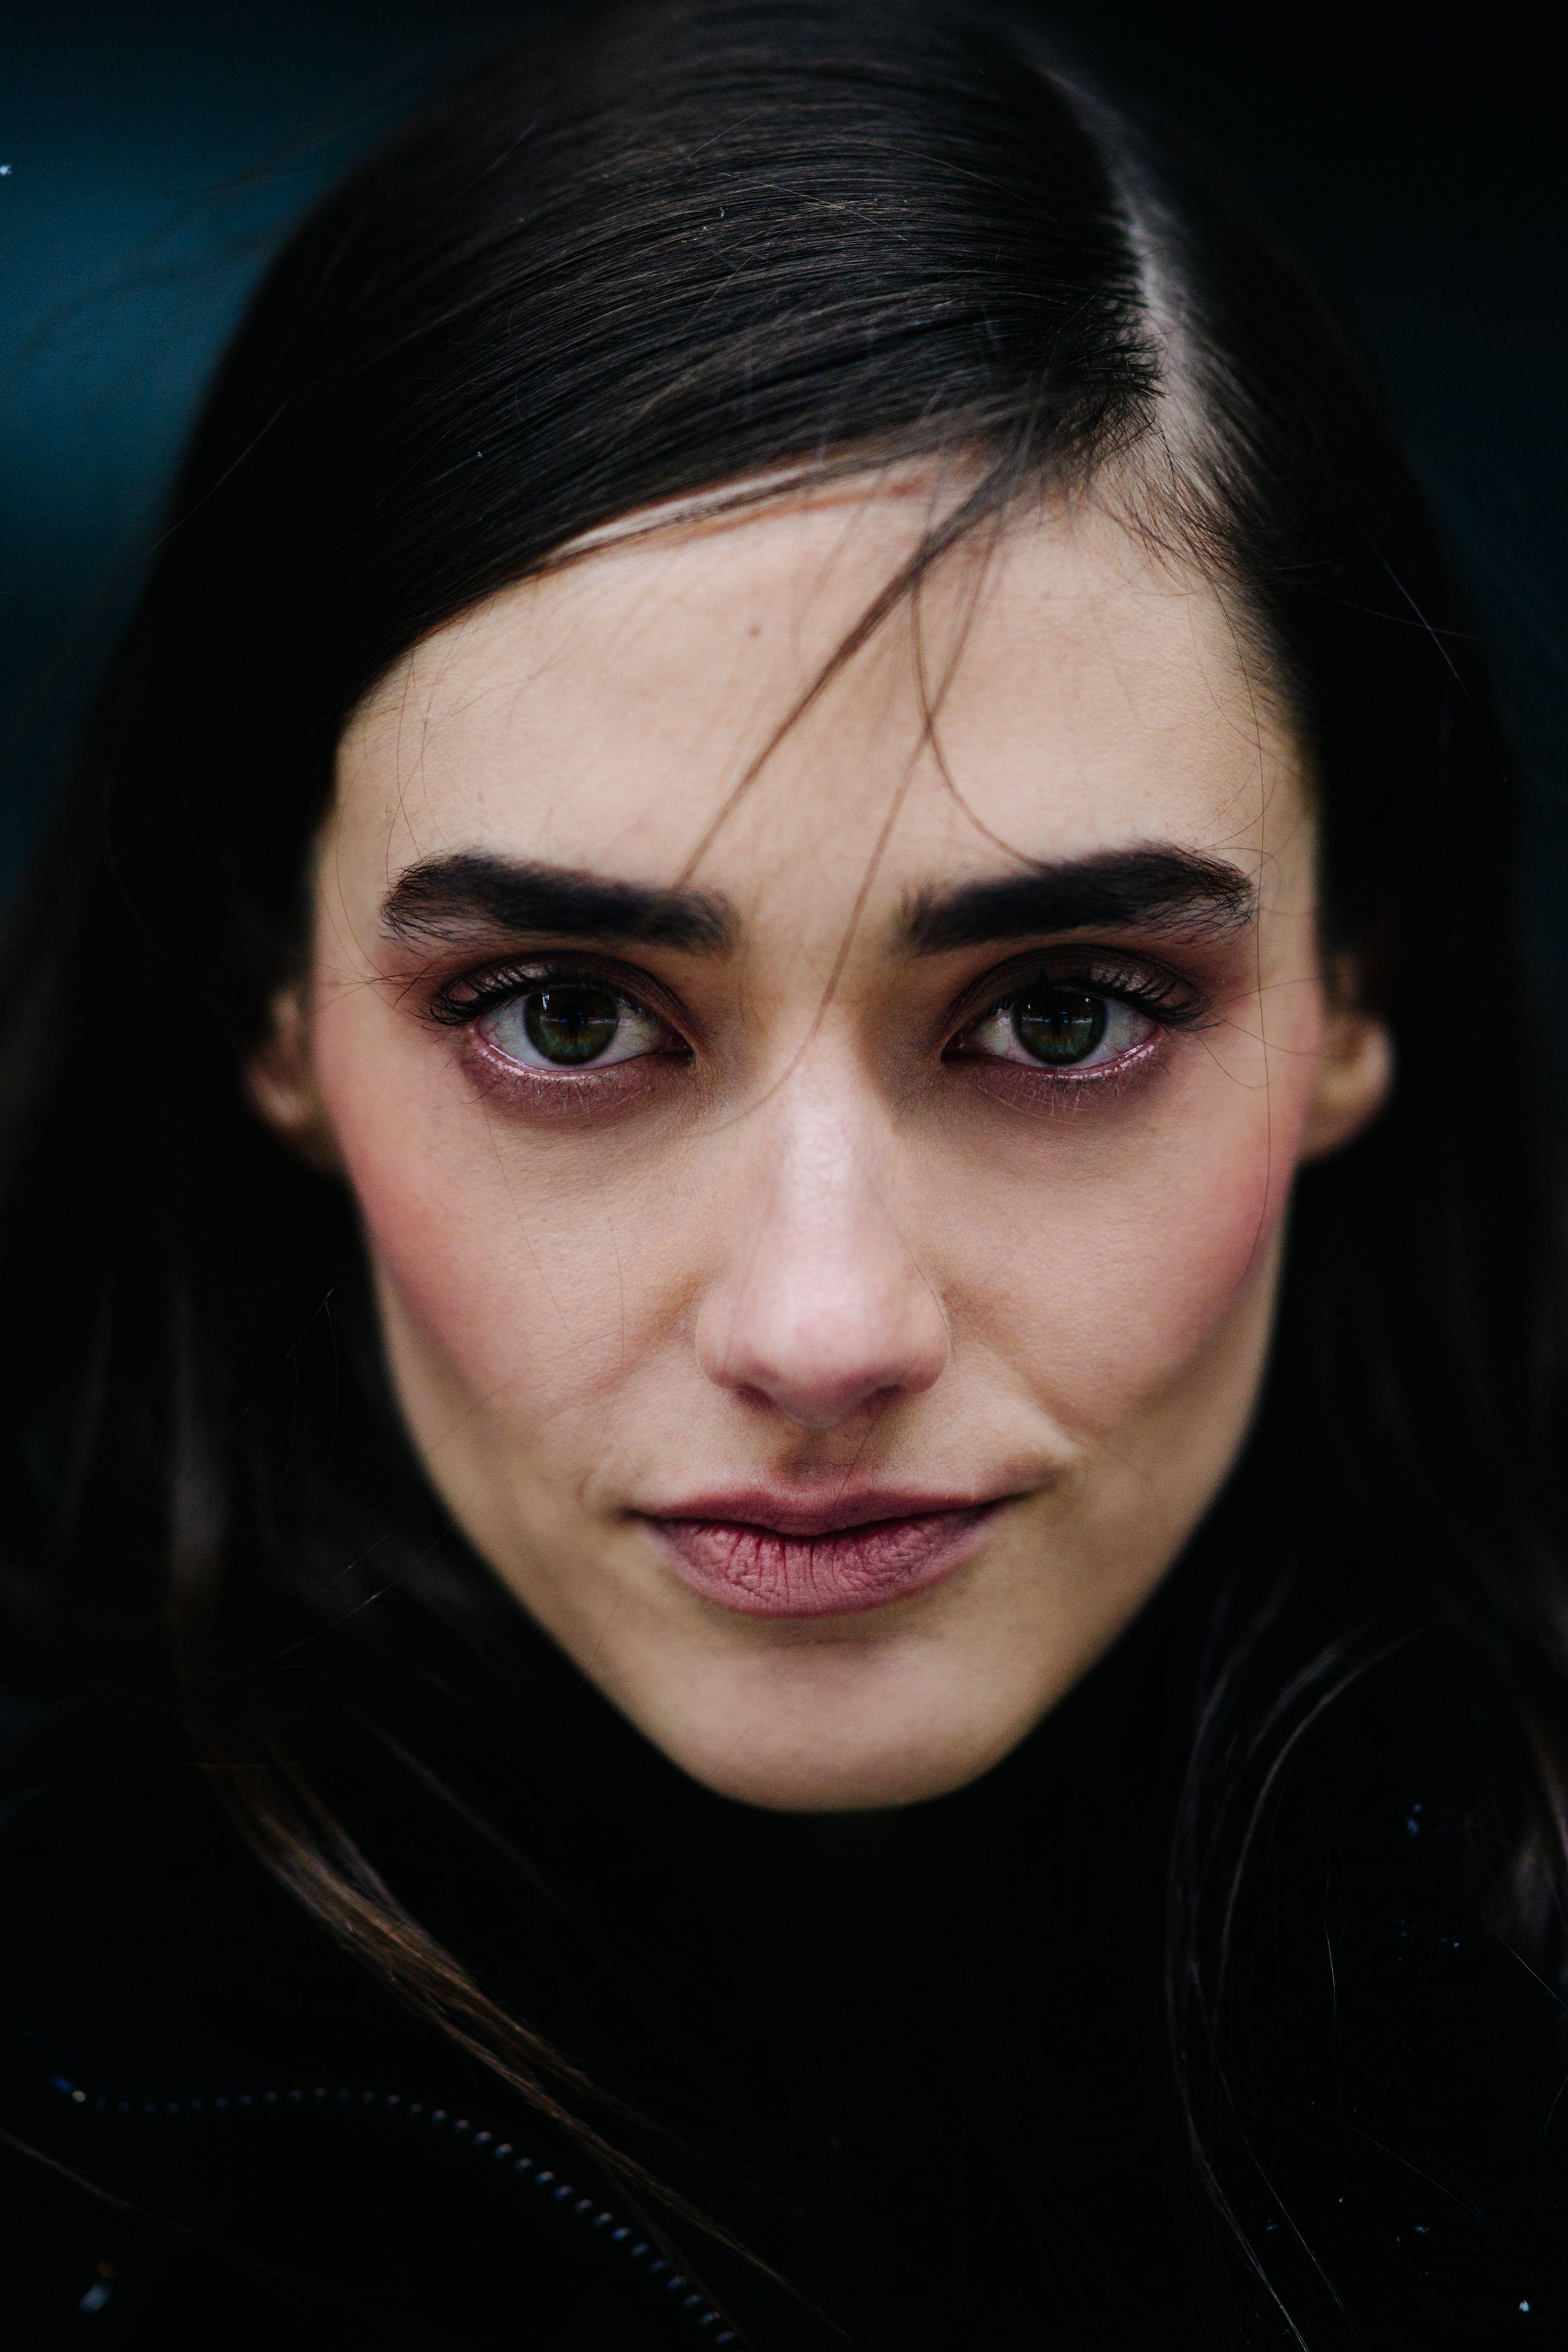 OLDUSHKA | Woman face, Female portrait, Portrait